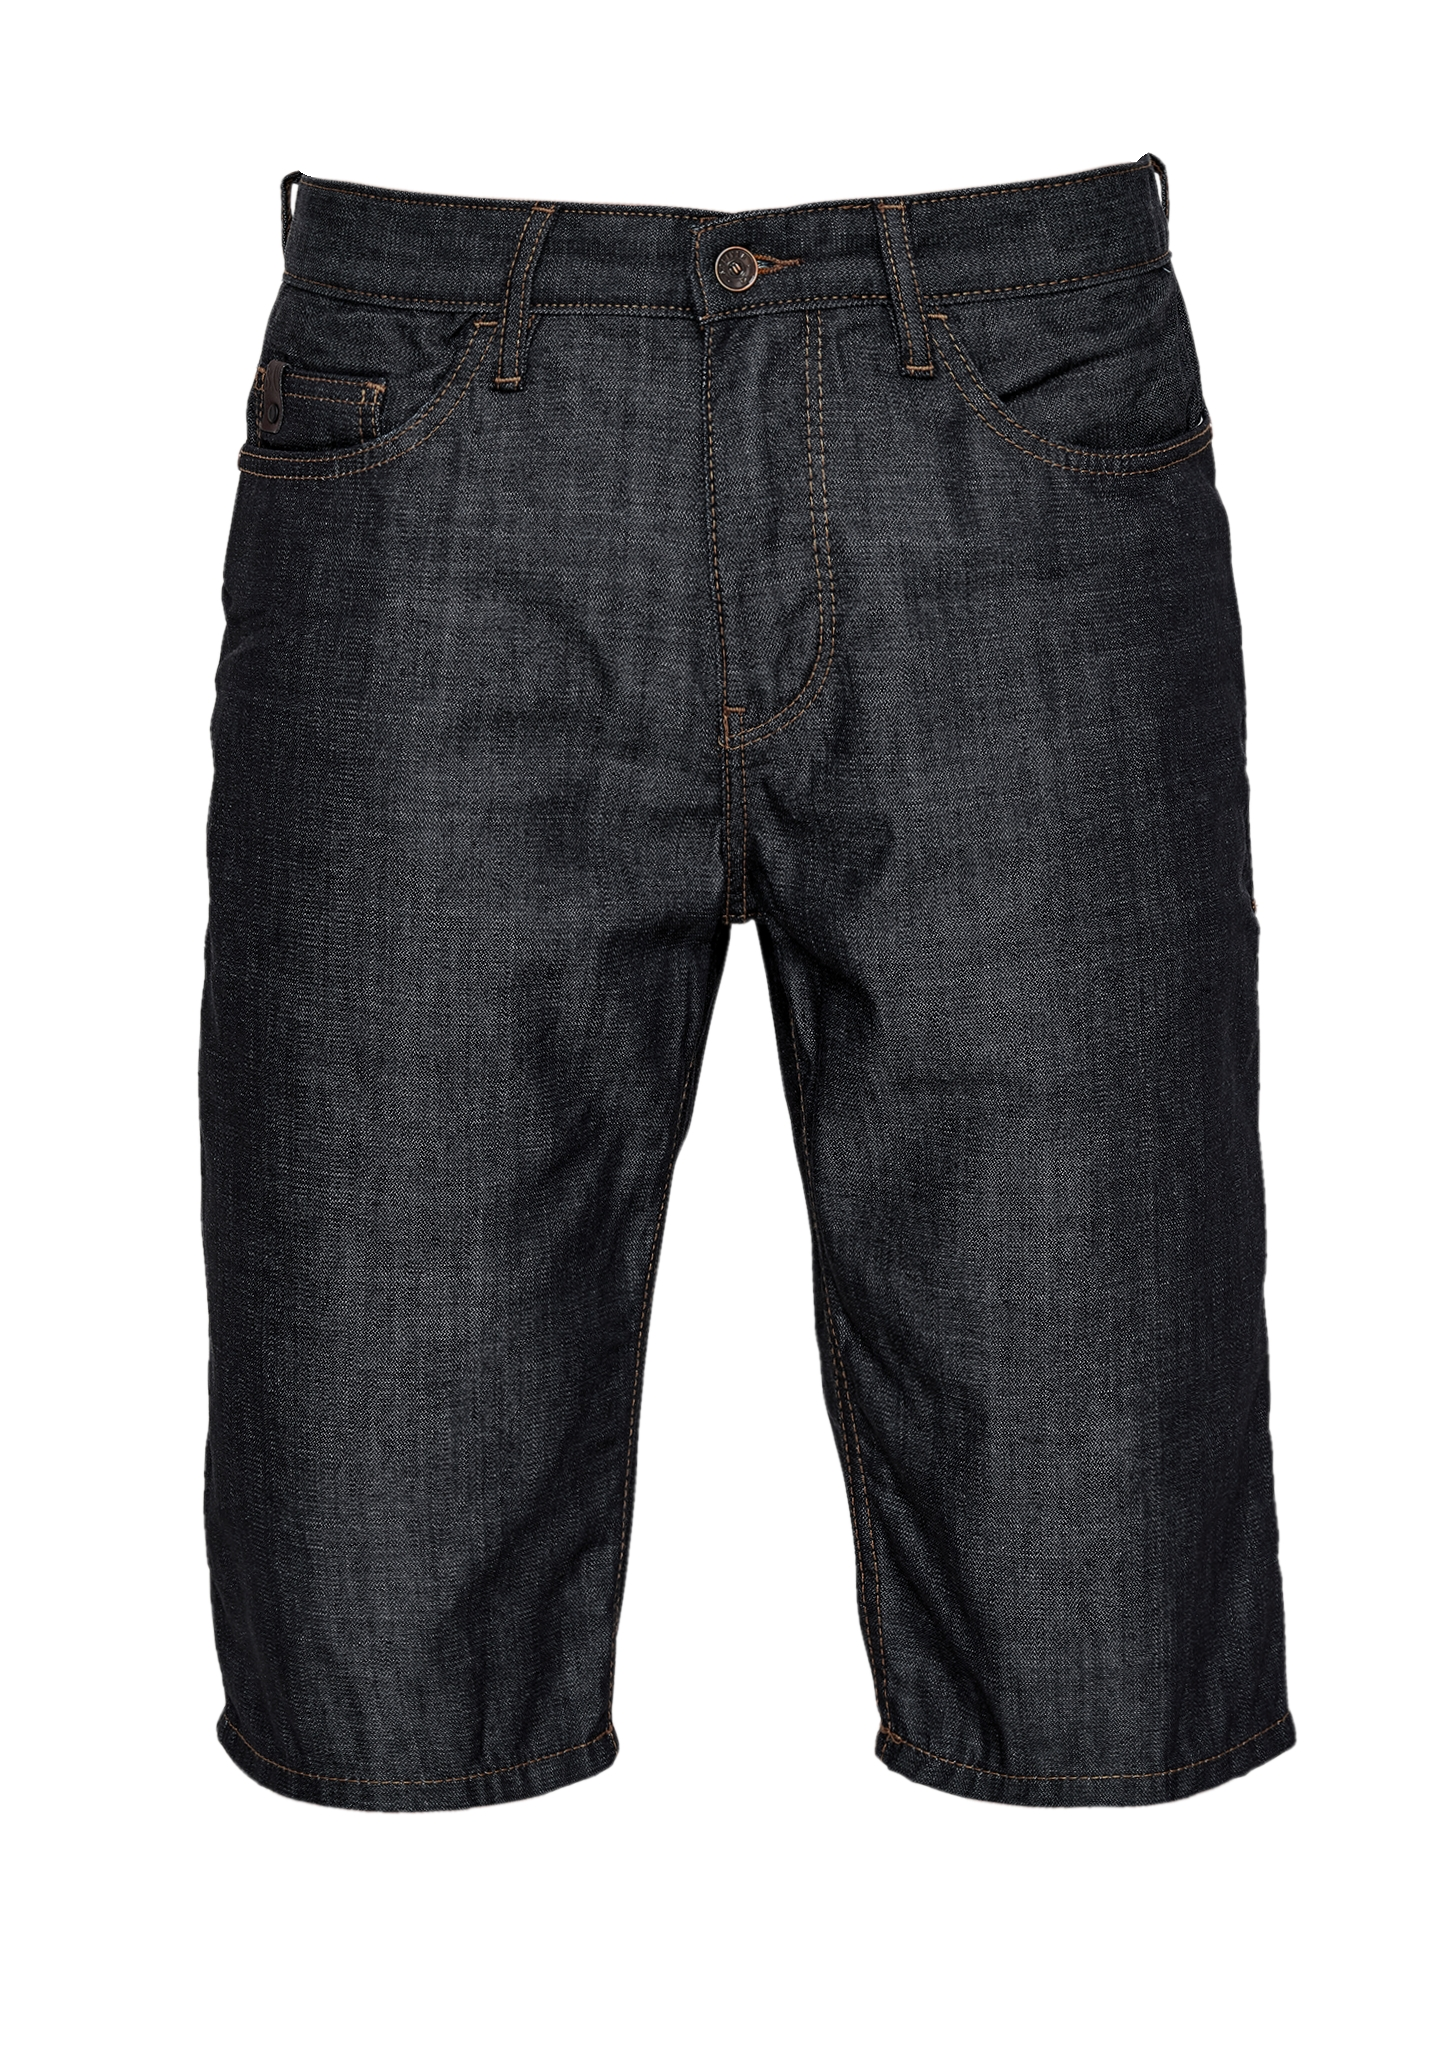 Denim-Shorts | Bekleidung > Shorts & Bermudas | s.Oliver